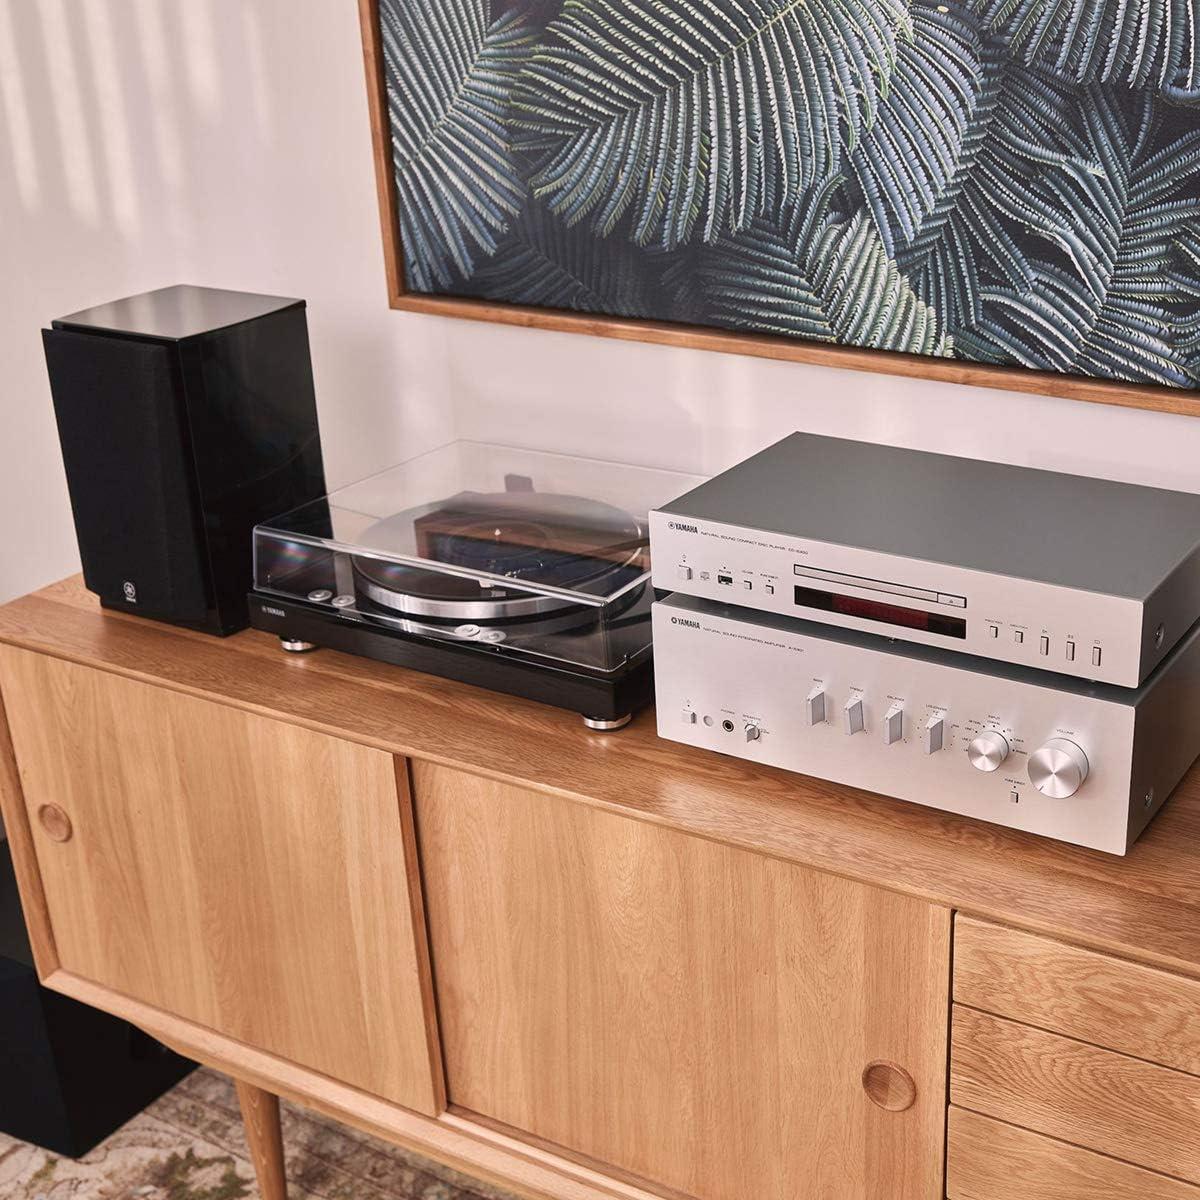 Piano Black Yamaha TT-S303 Hi-Fi Vinyl Belt Drive Turntable